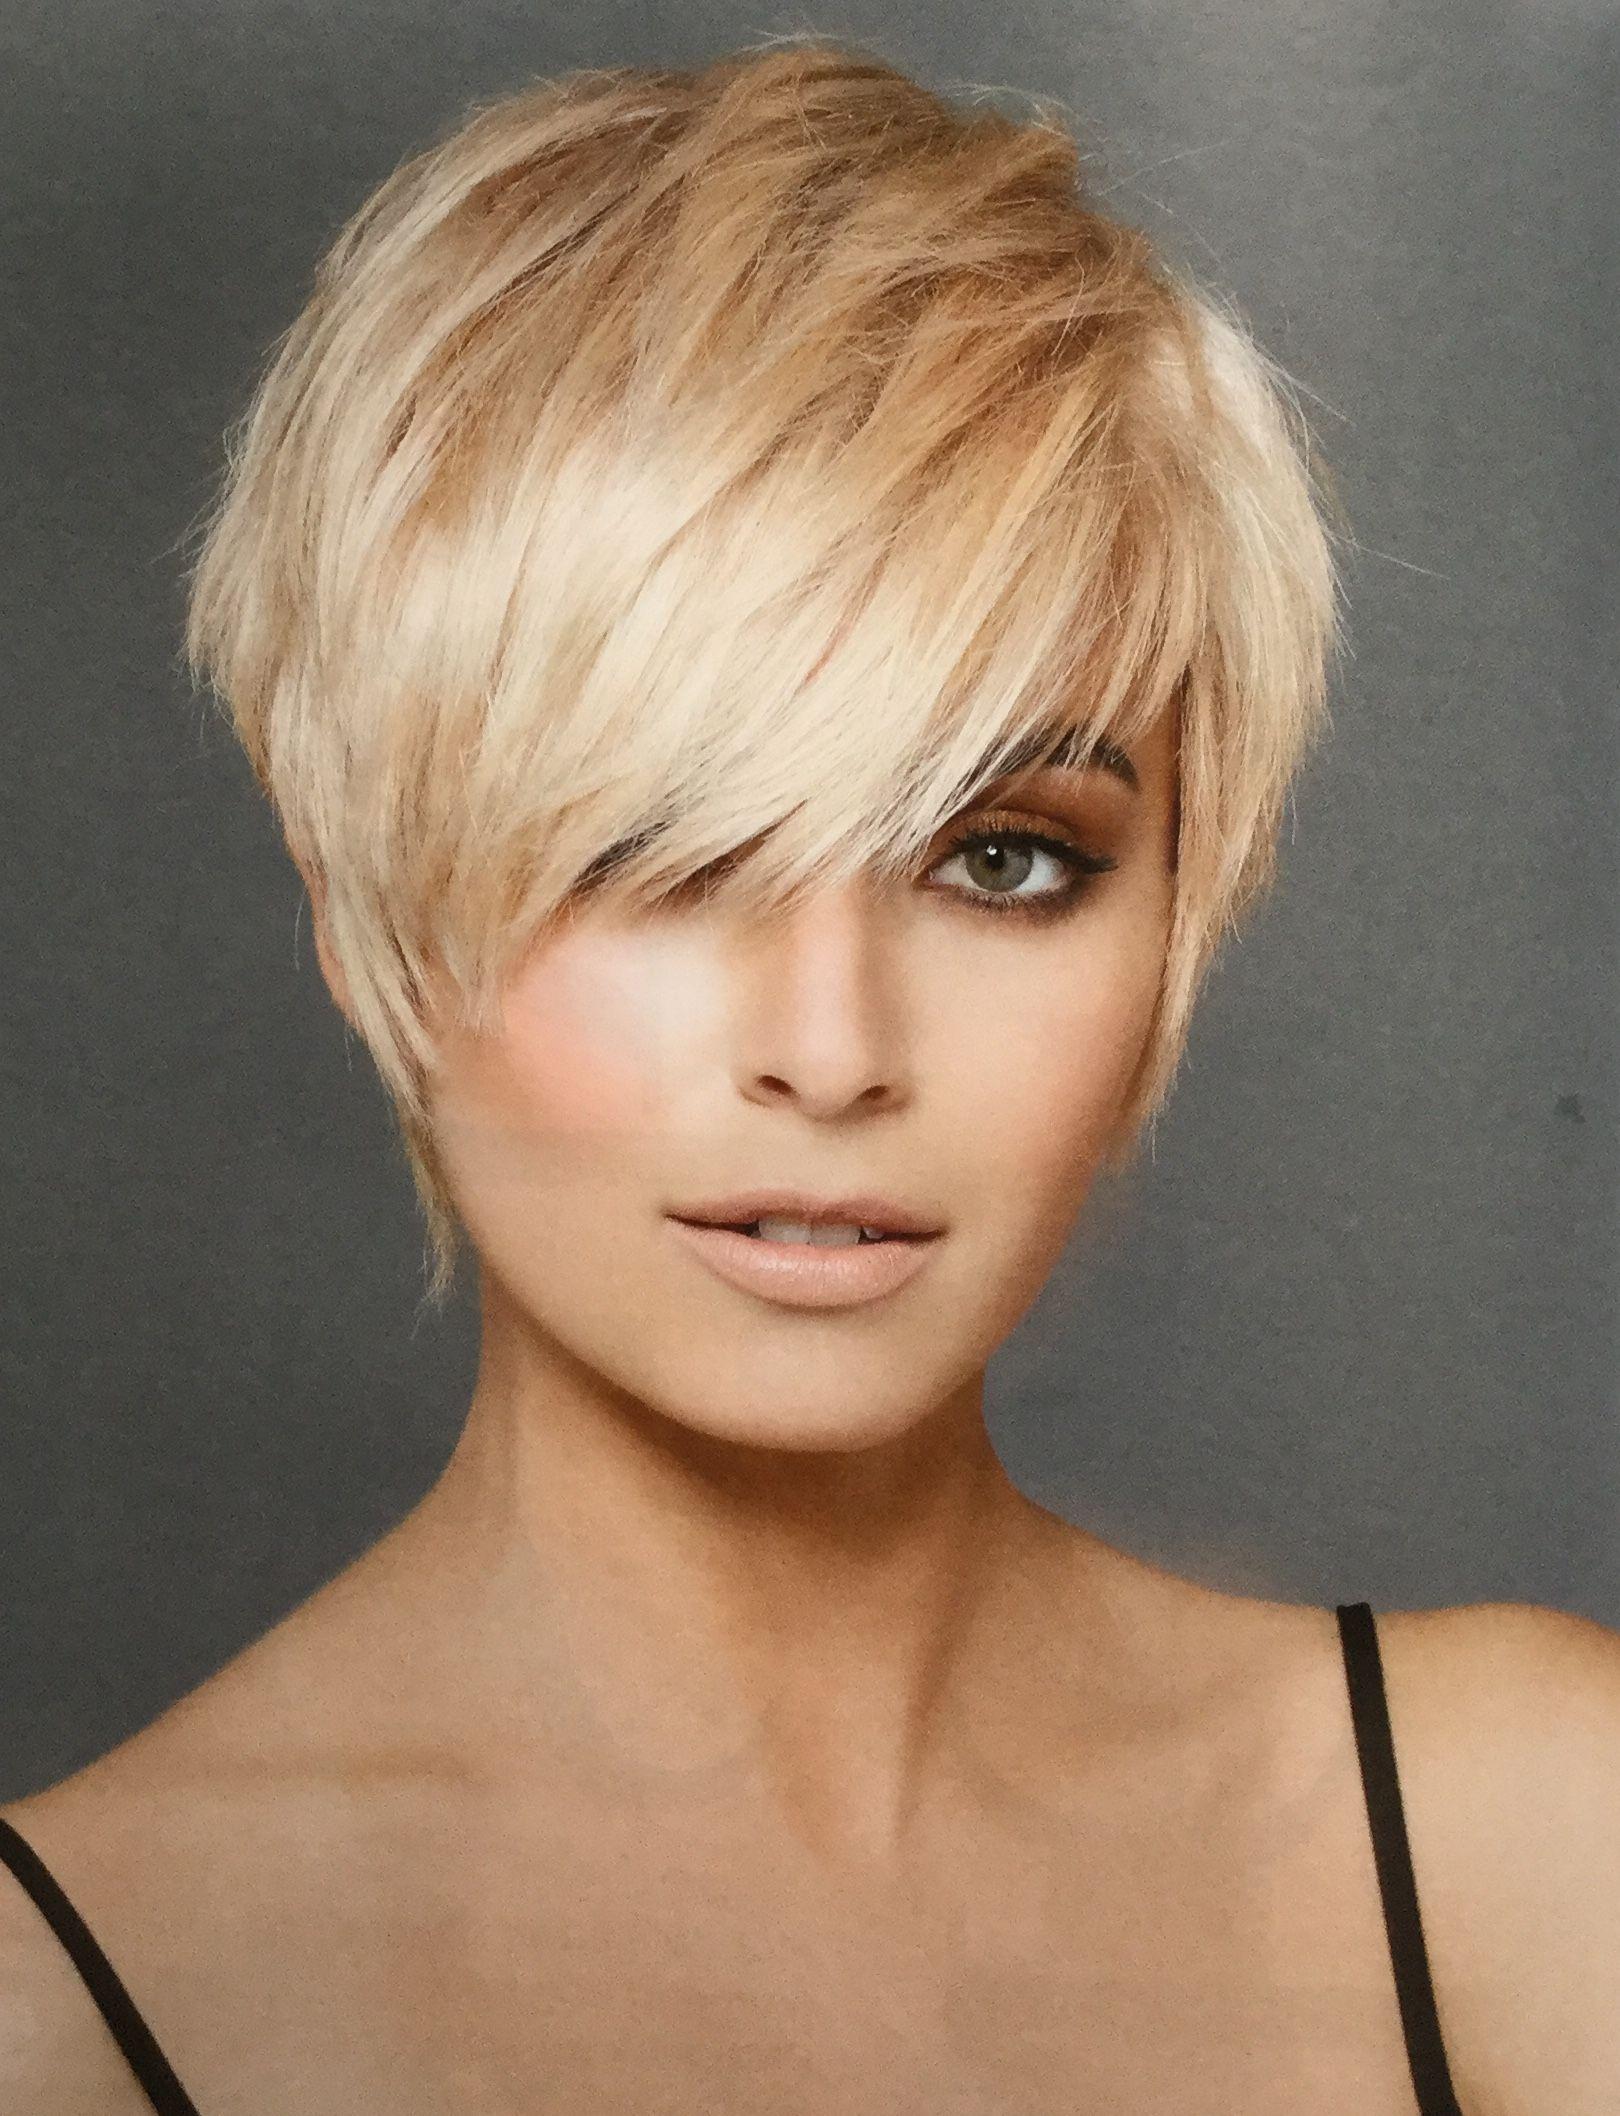 Pin By Marie Holroyde On Hair Pinterest Haircut Styles Hair